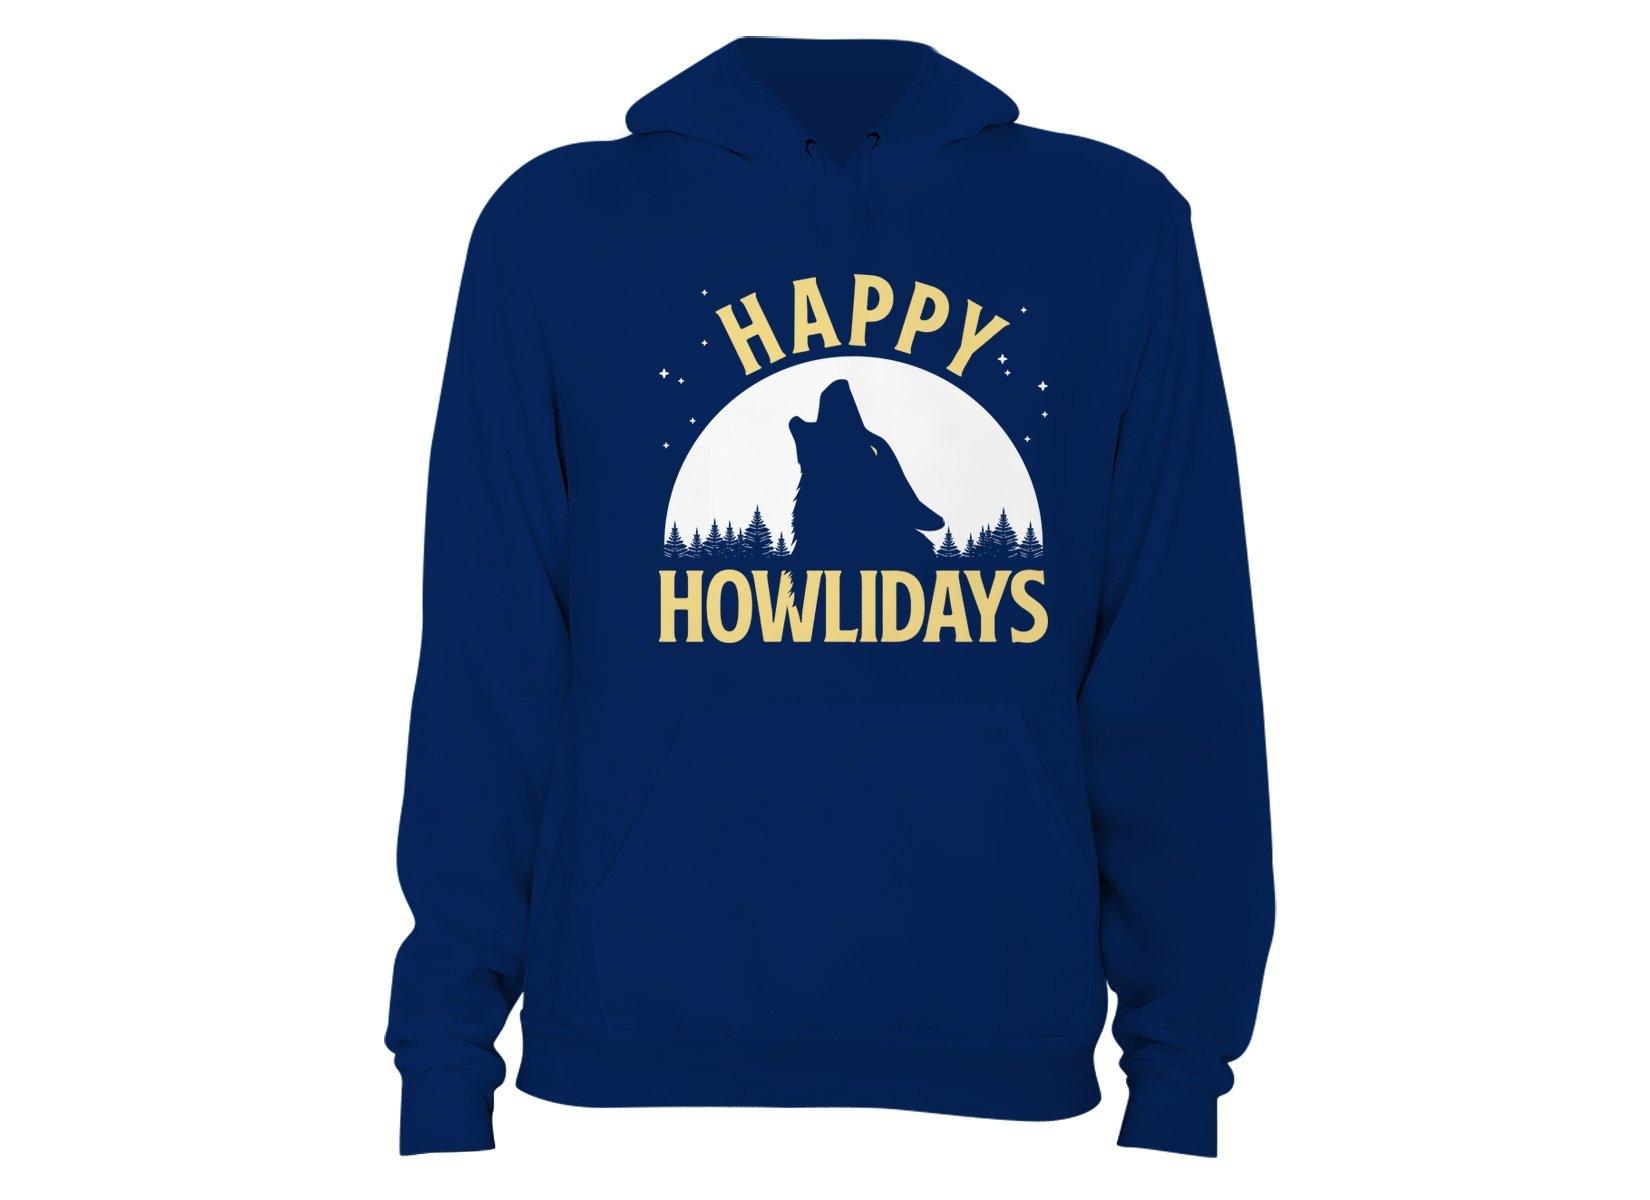 Happy Howlidays on Hoodie